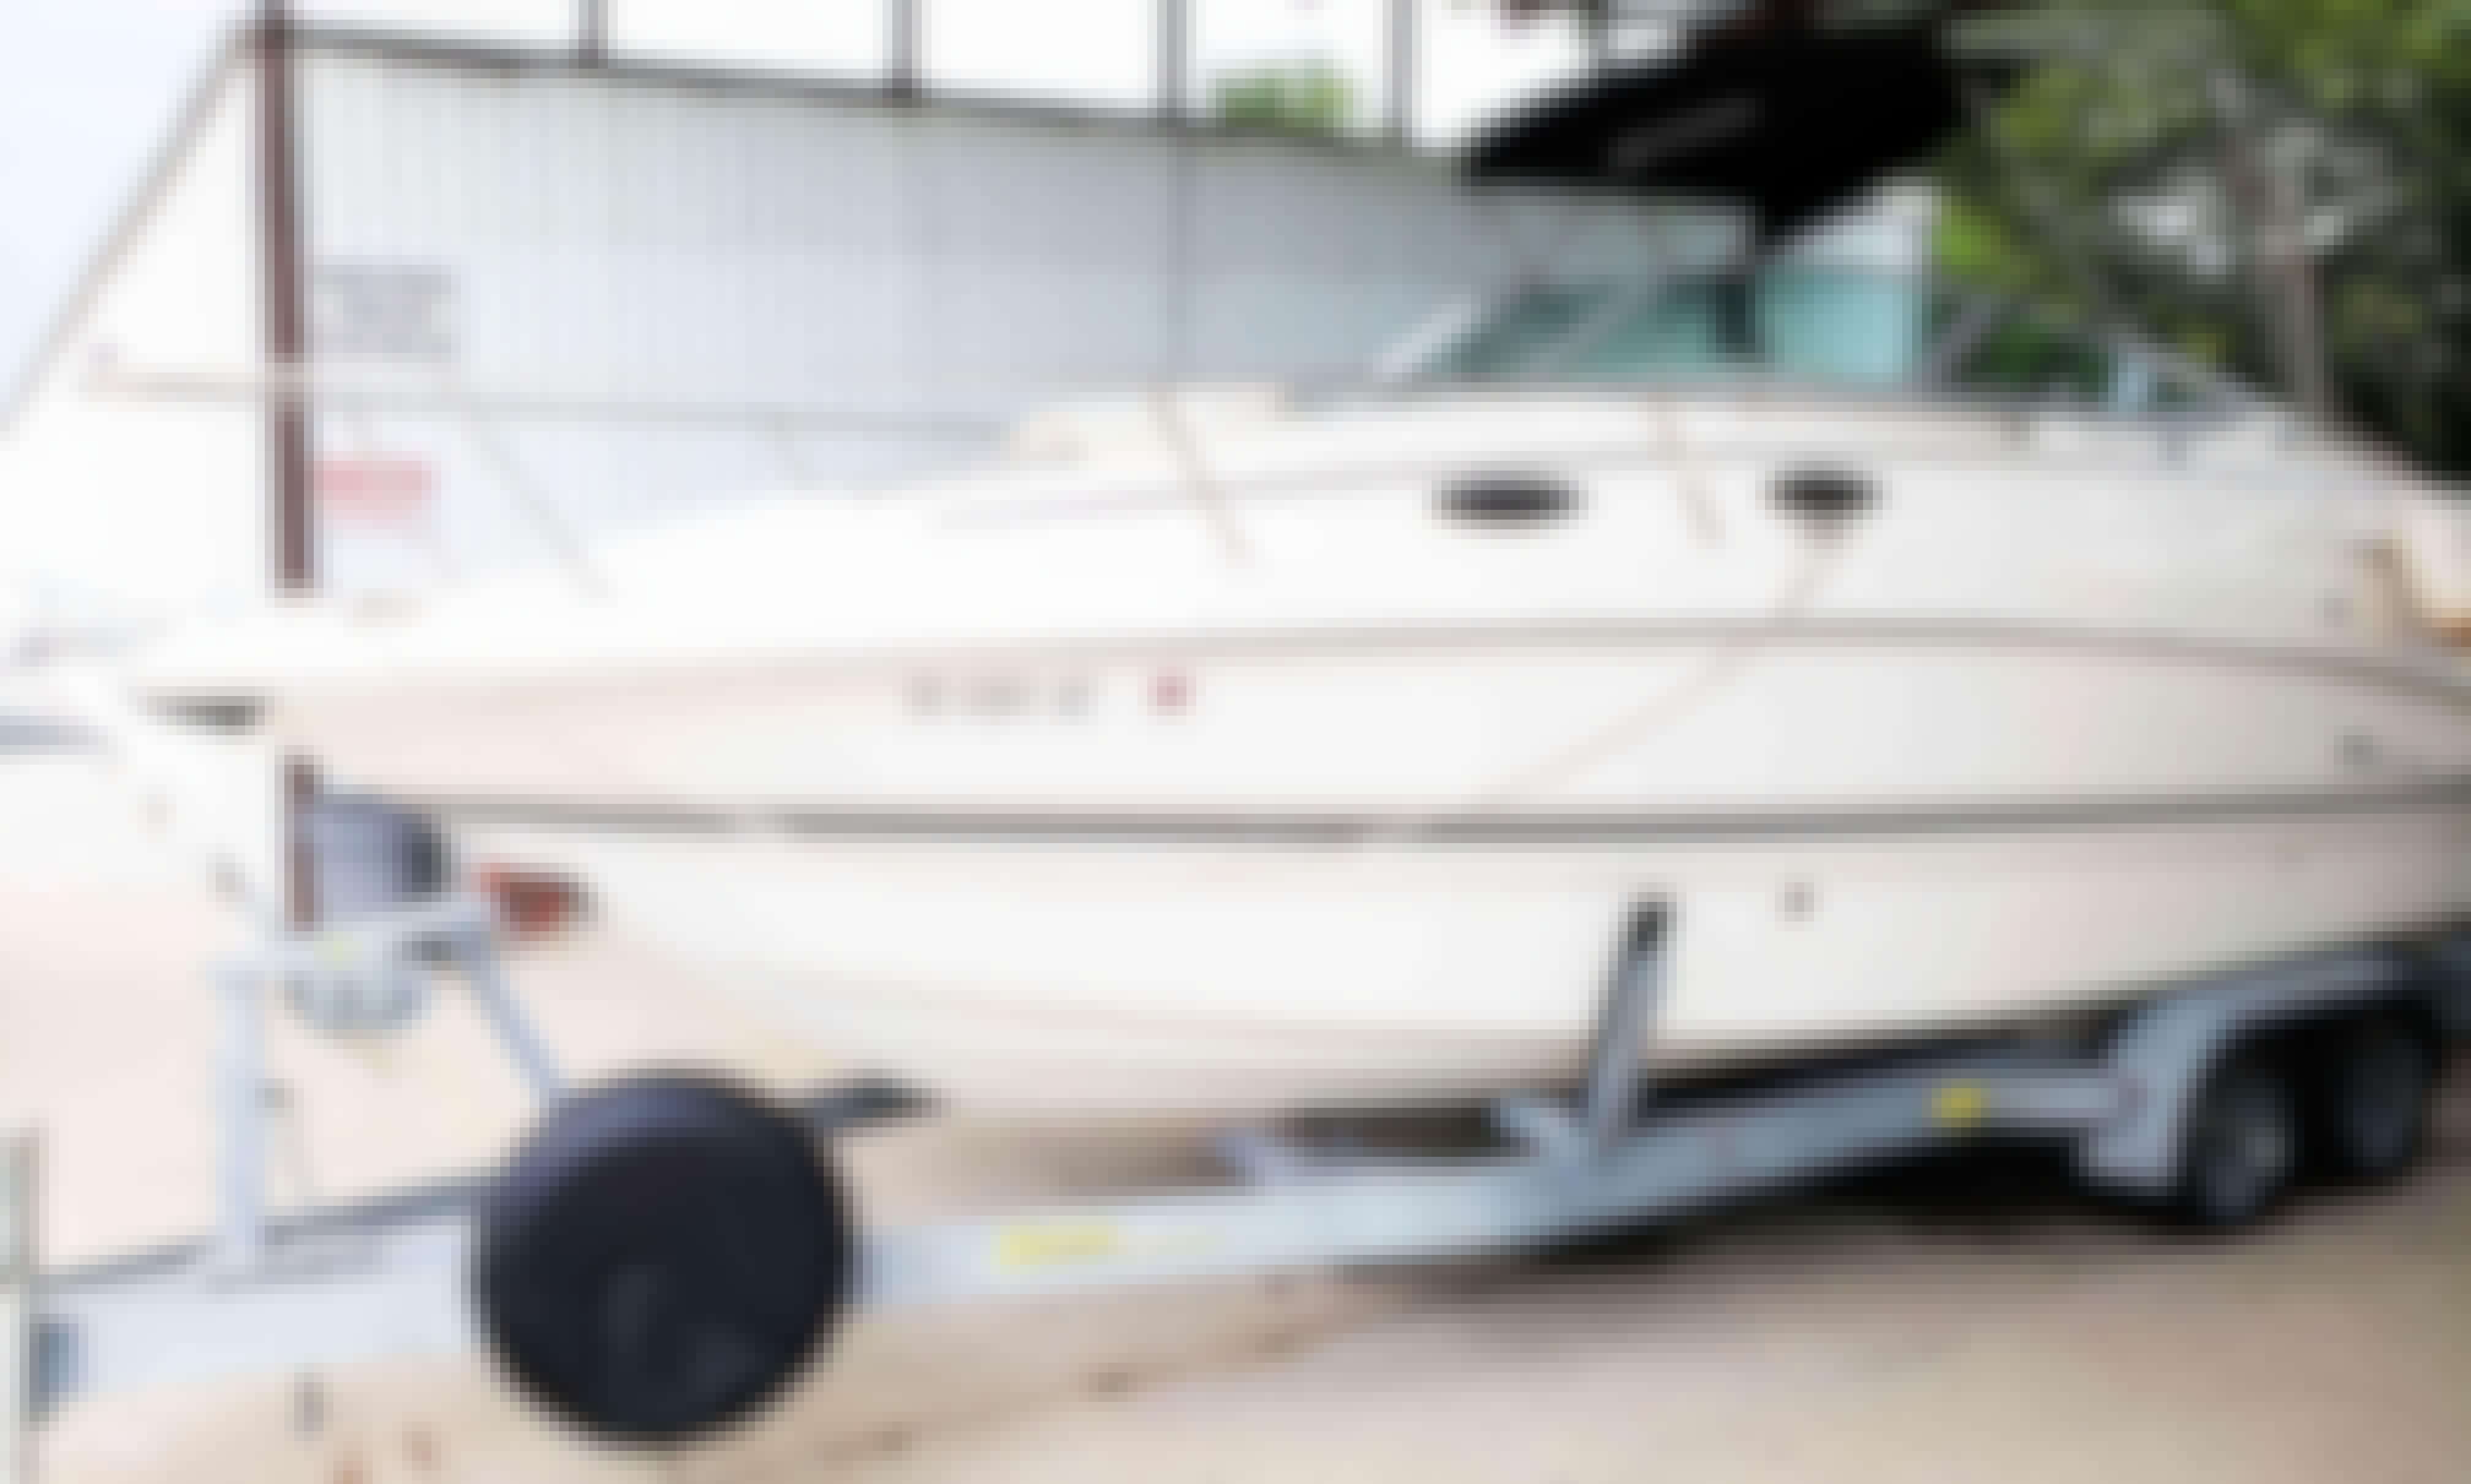 26' Chaparral 240 Signature Cabin Cruiser Mini Yacht Lewisville, Texas